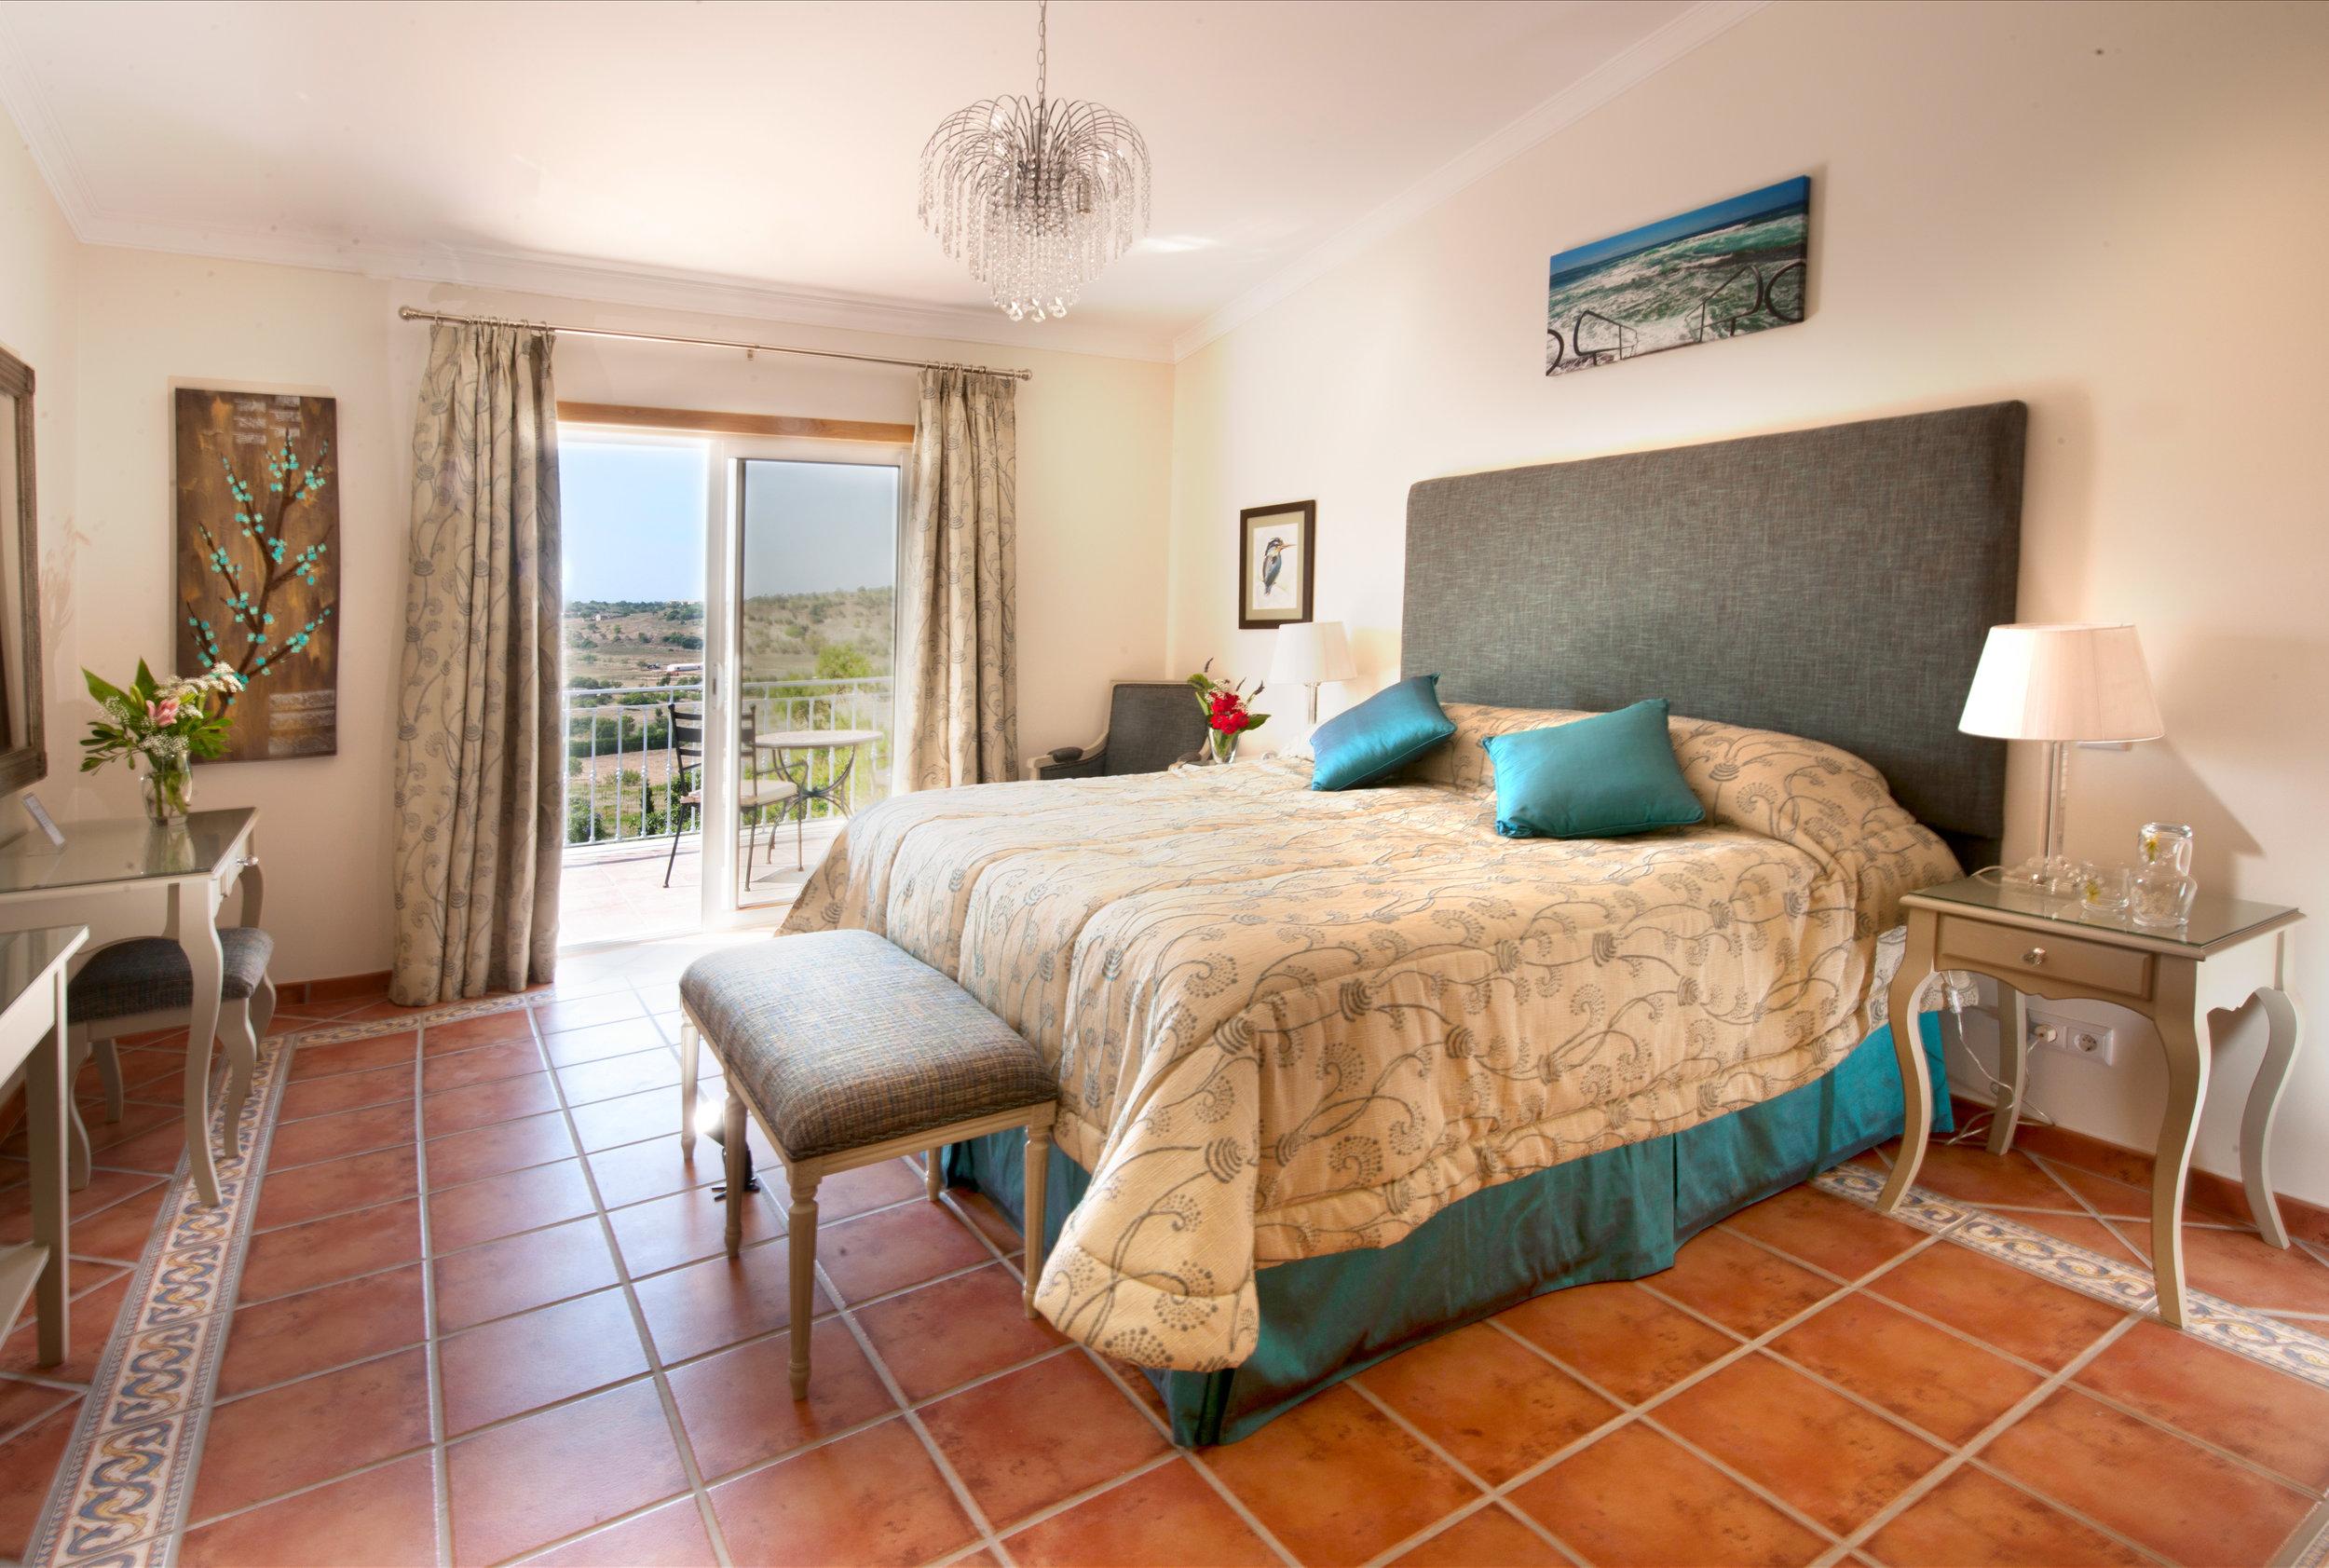 12 Camilo Suite with Sea View.jpg